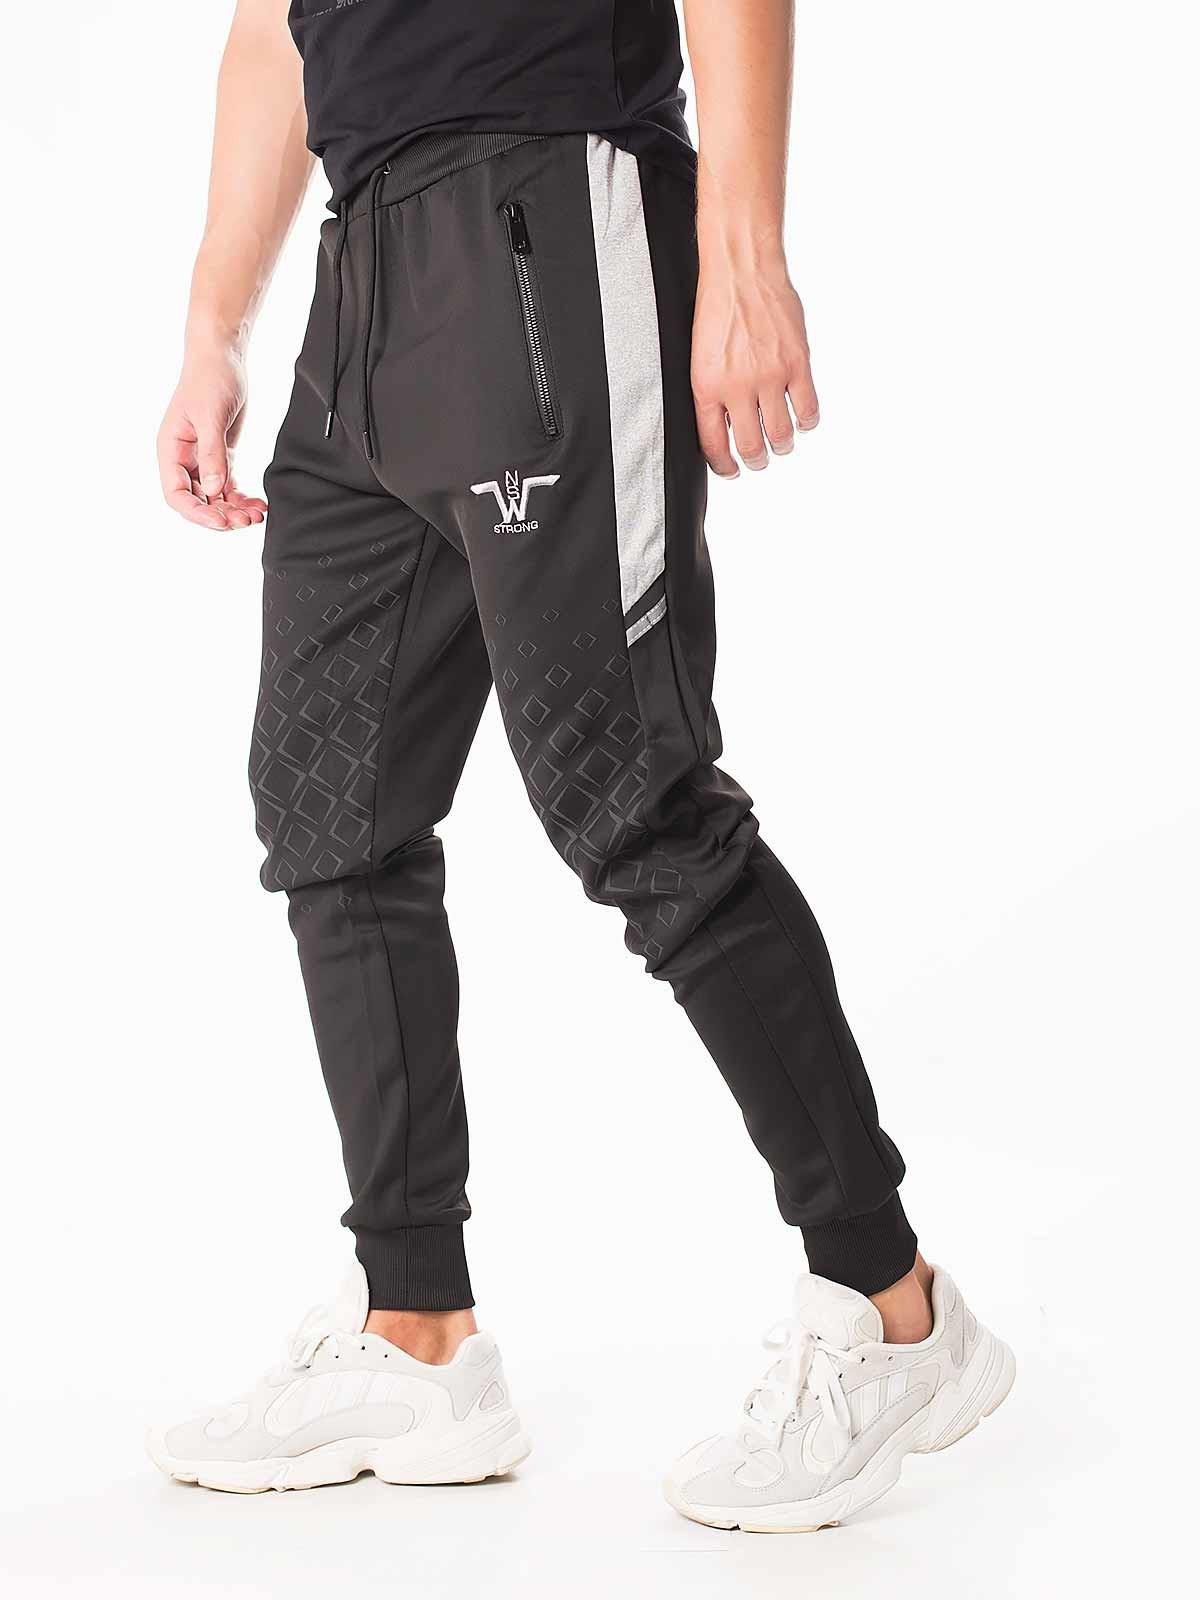 Pantalones deportivos Army Sports